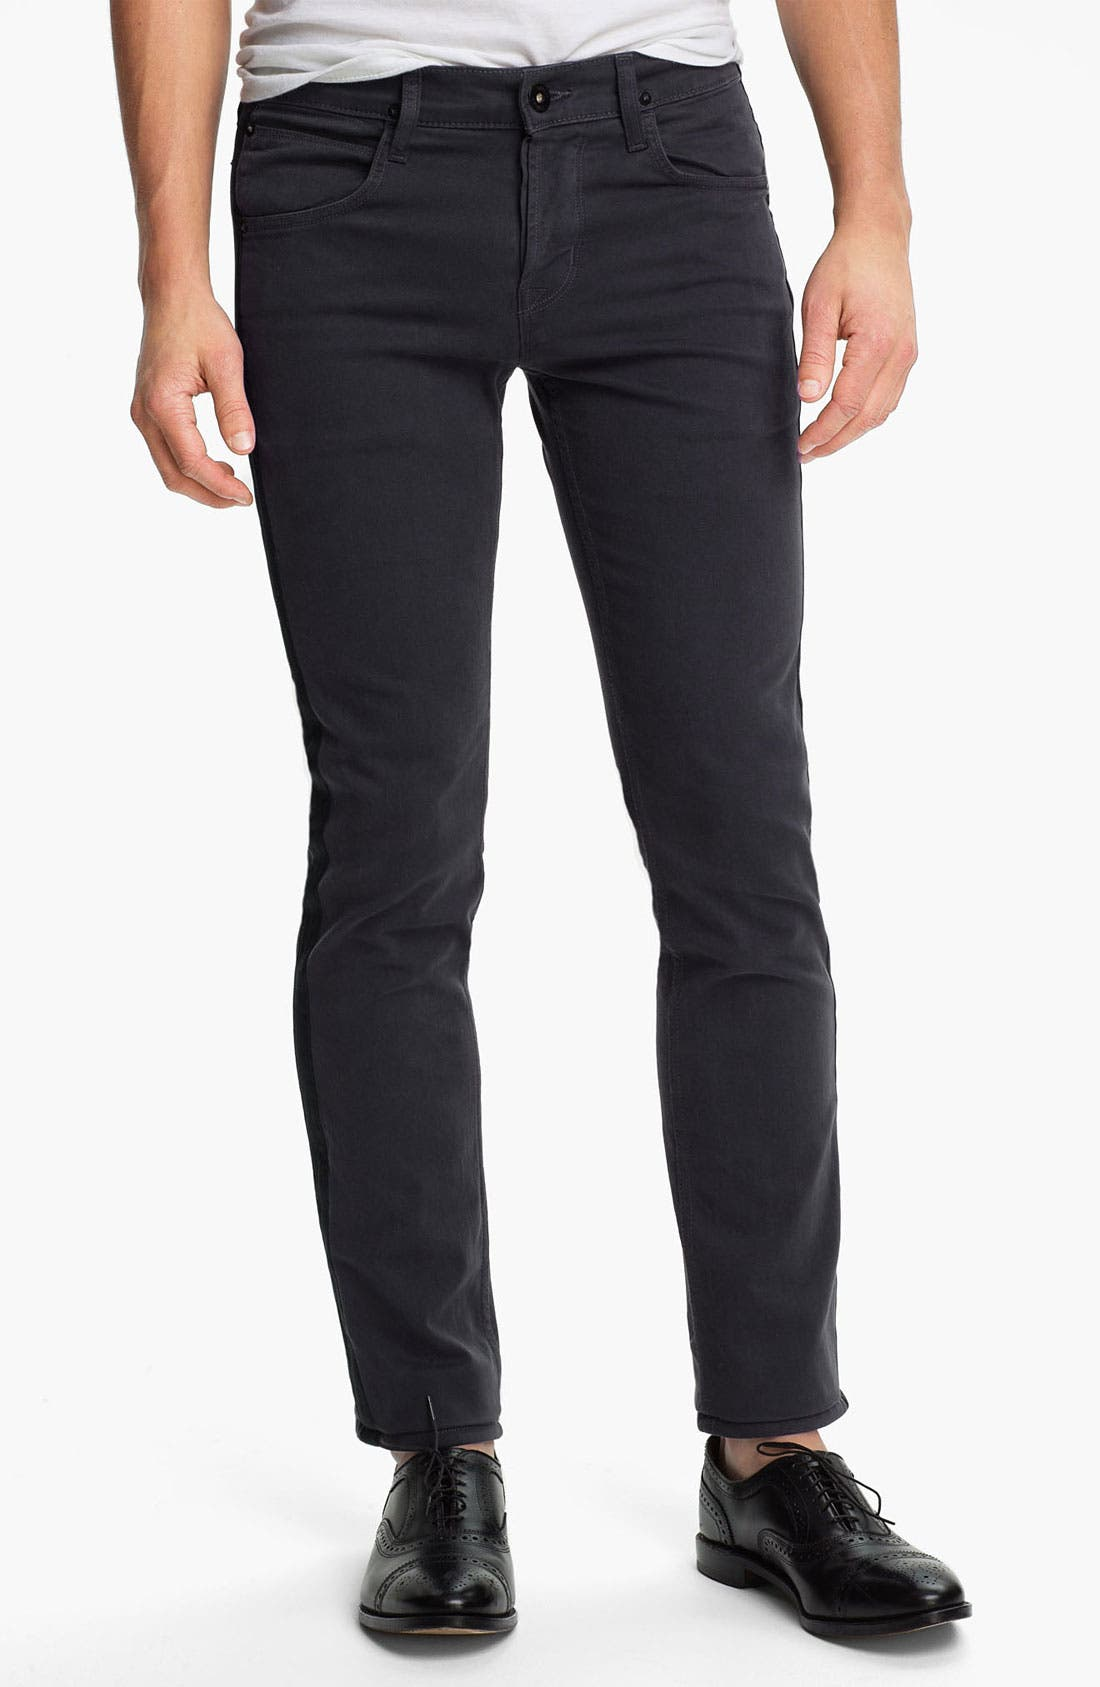 Alternate Image 2  - Hudson Jeans 'Lou Tuxedo' Slim Straight Leg Jeans (Incognito)